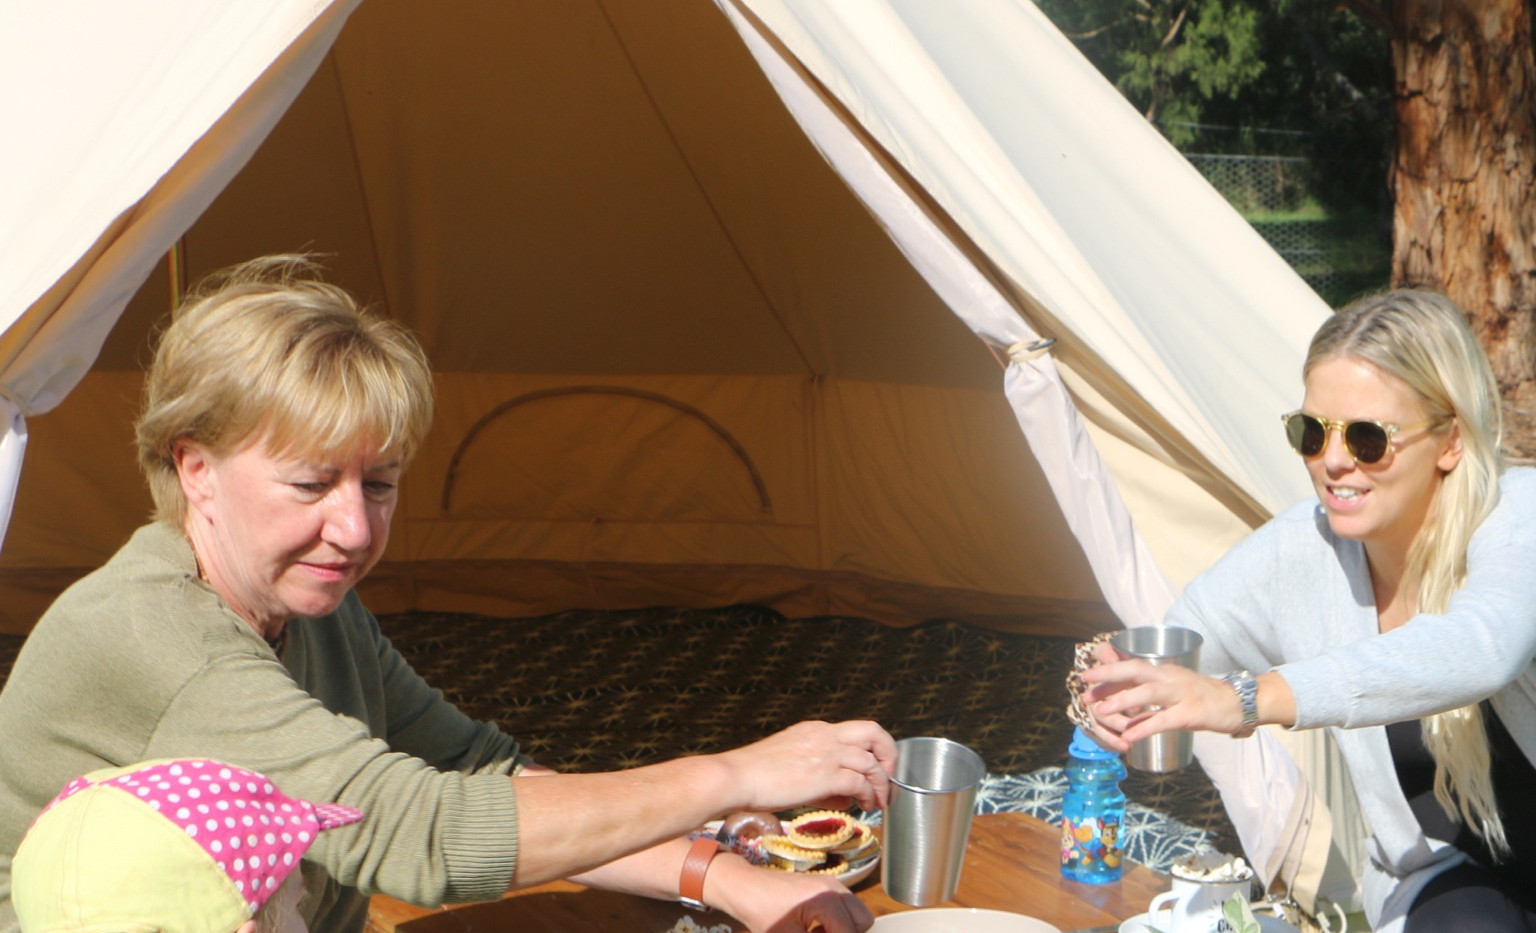 Wow Tents kidsKAMP Family Fun Dining